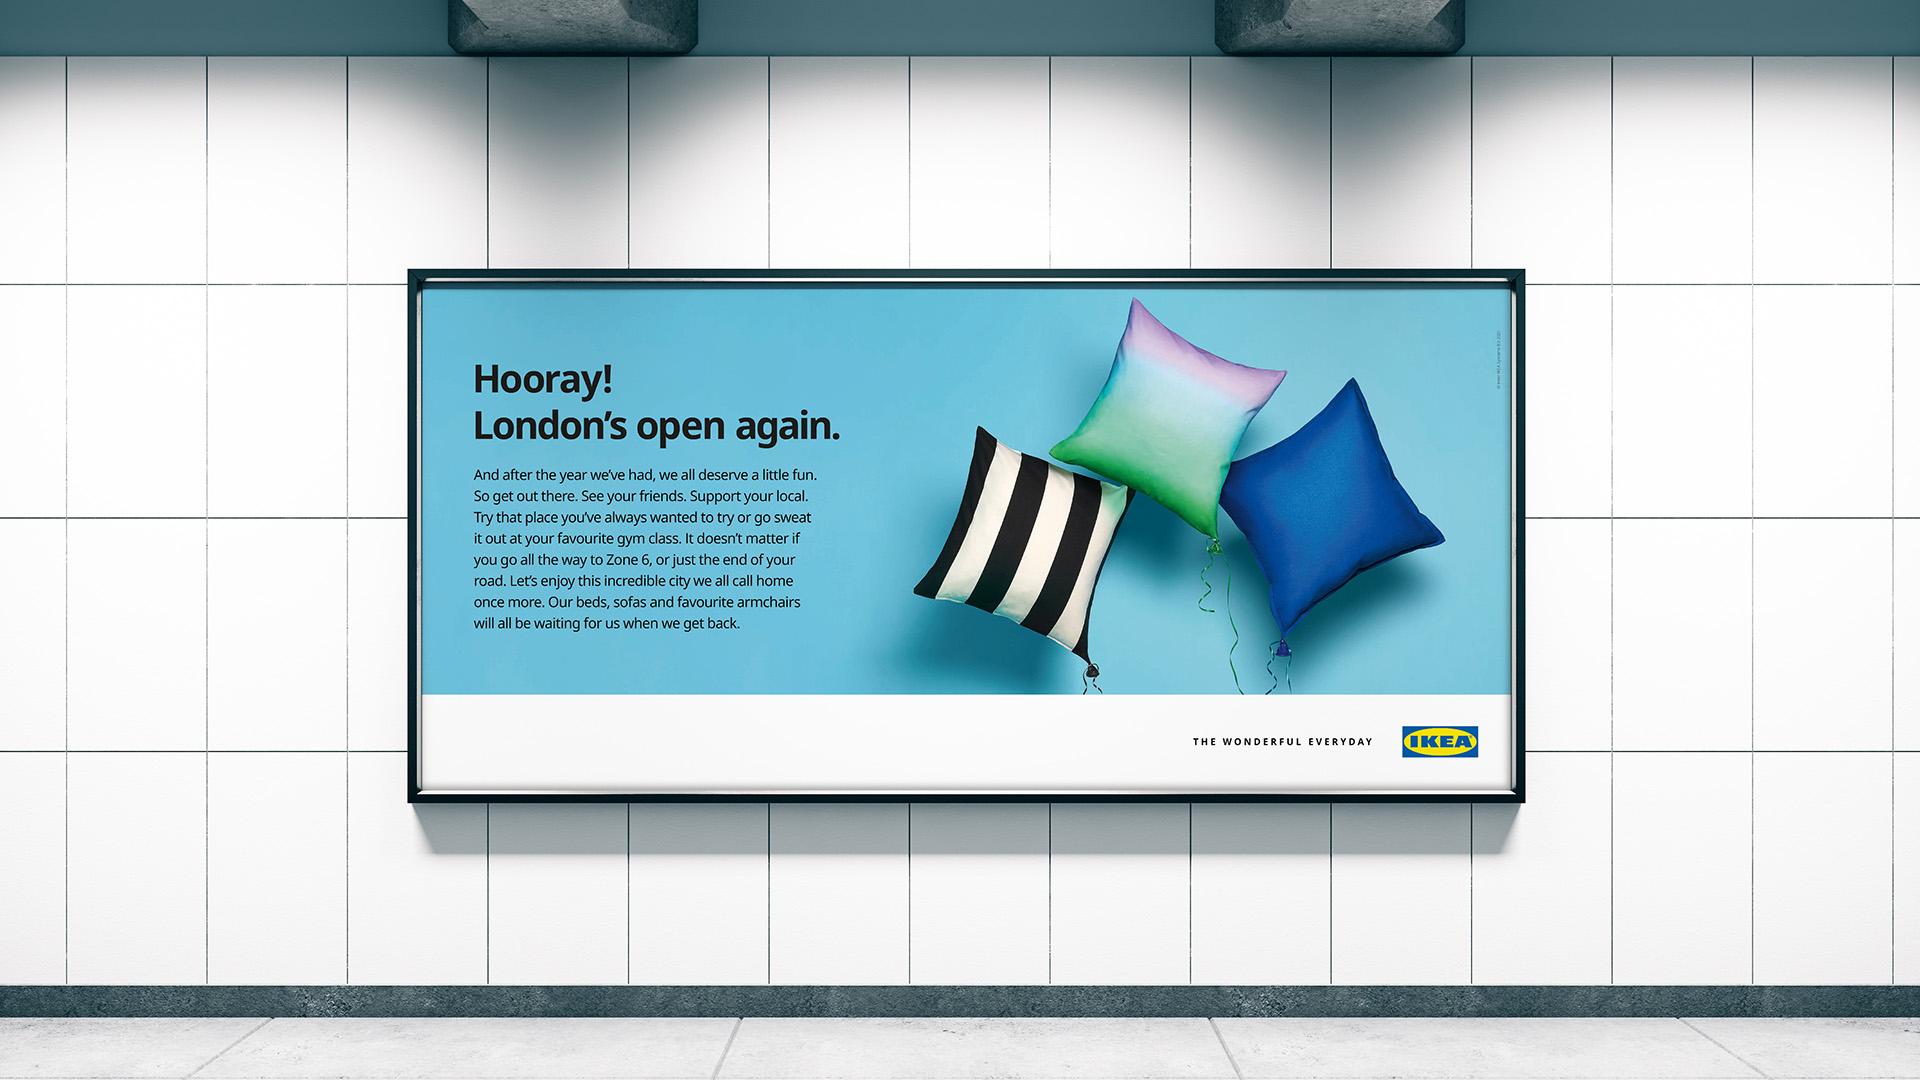 IKEA - Home Can Wait